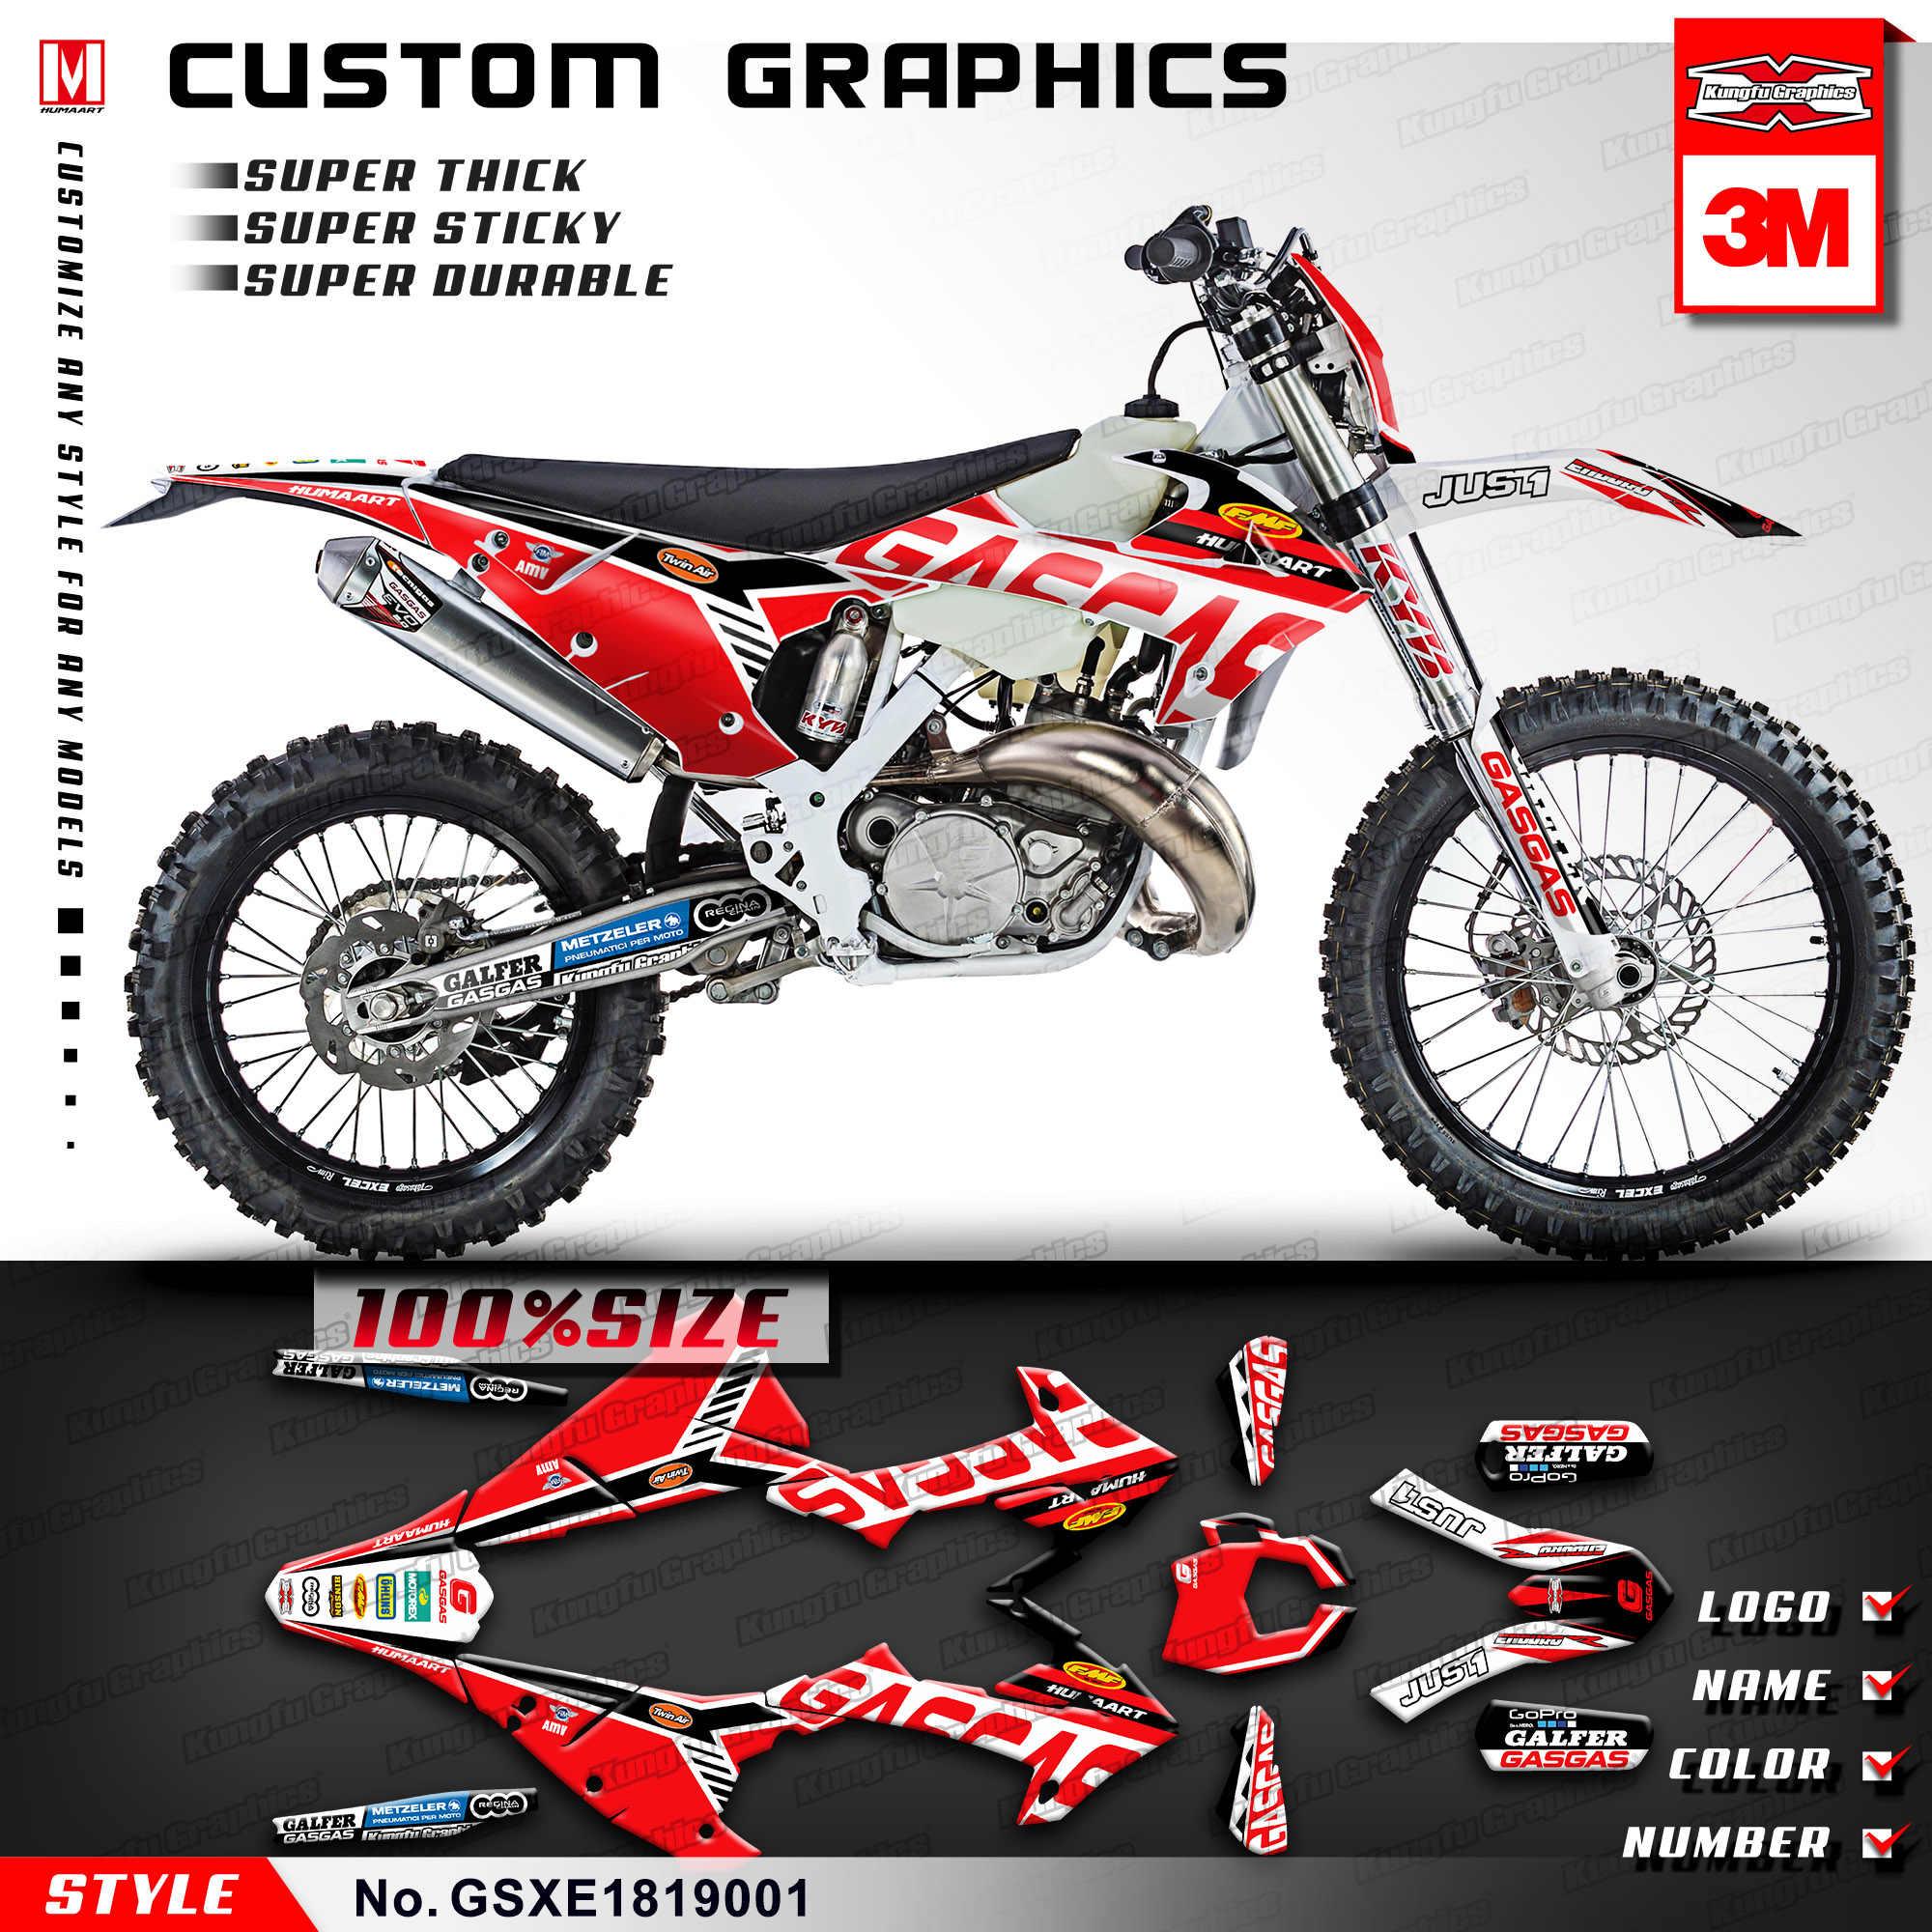 Kungfu graphics custom mx stickers kit for gas gas xc ec 200 250 300 ecranger enduro